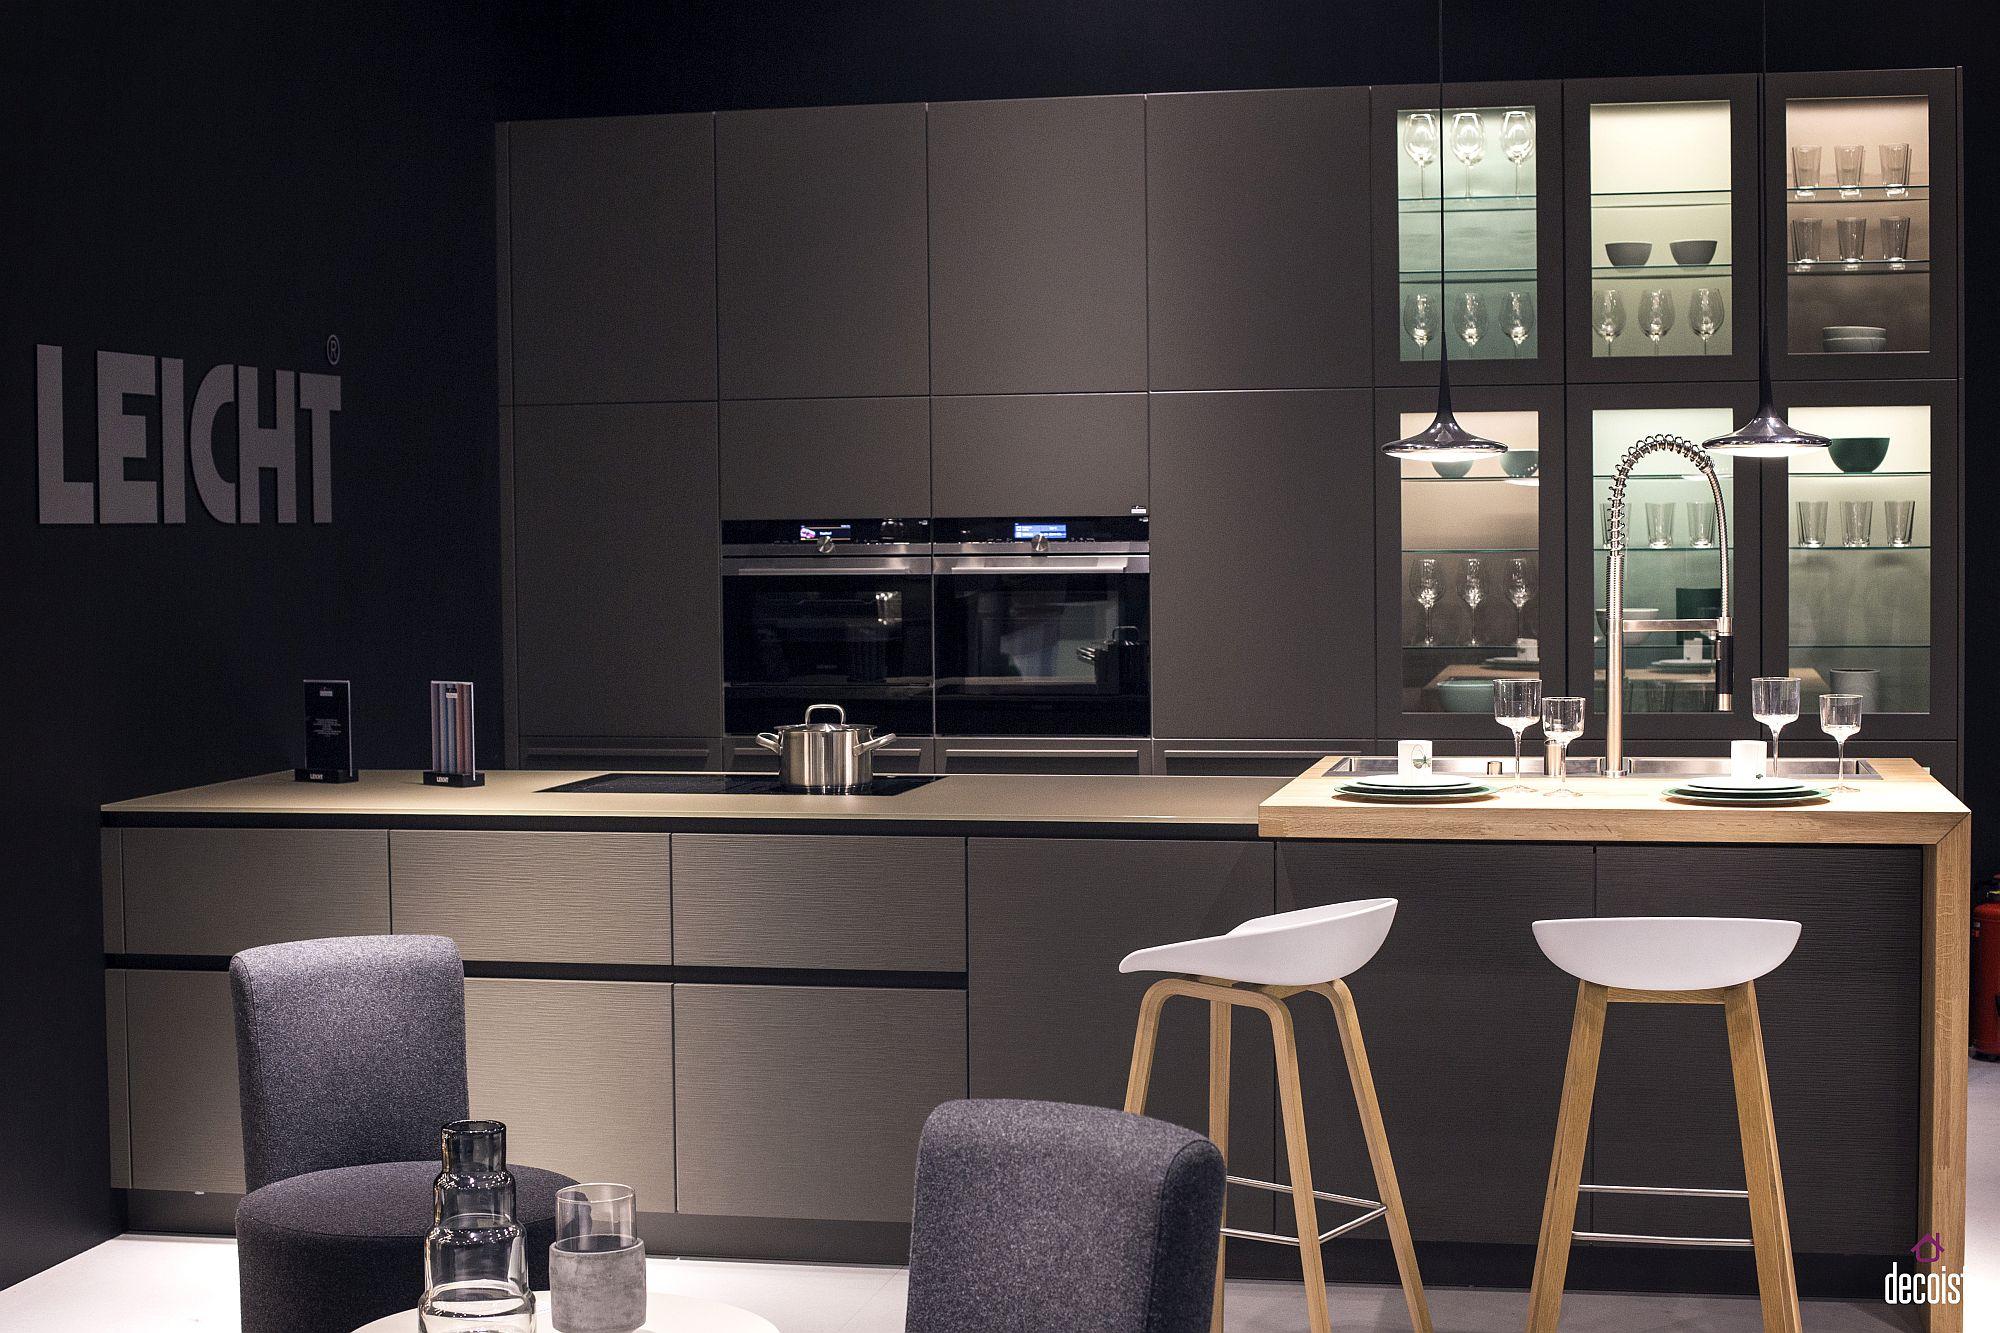 Modern kitchen in gray with wooden breakfast bar from Leicht